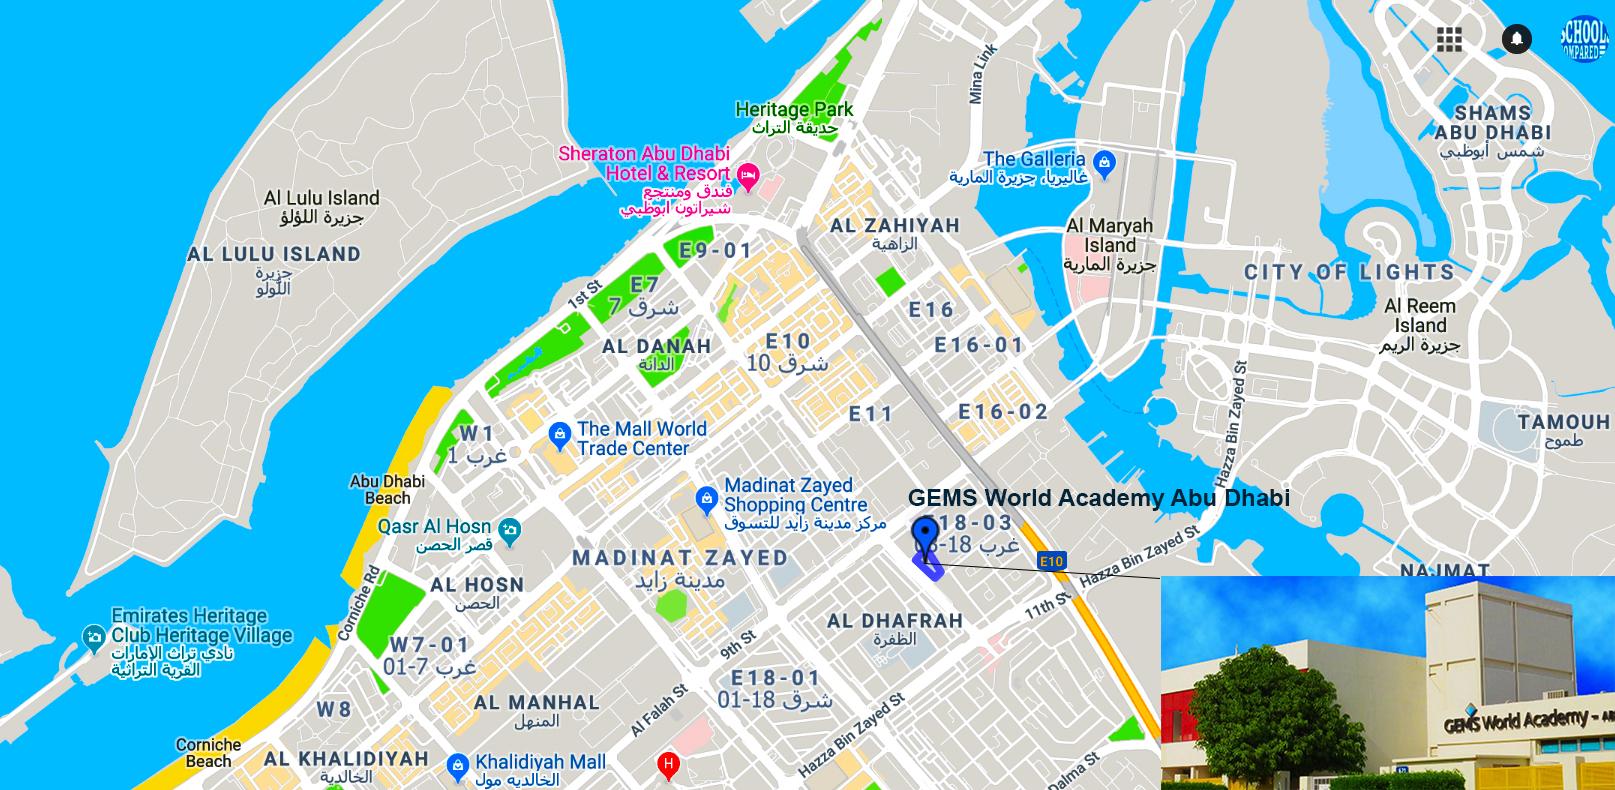 Gems World Academy Abu Dhabi  The Review – Dubai Schools regarding Gems World Academy Academic Calendar